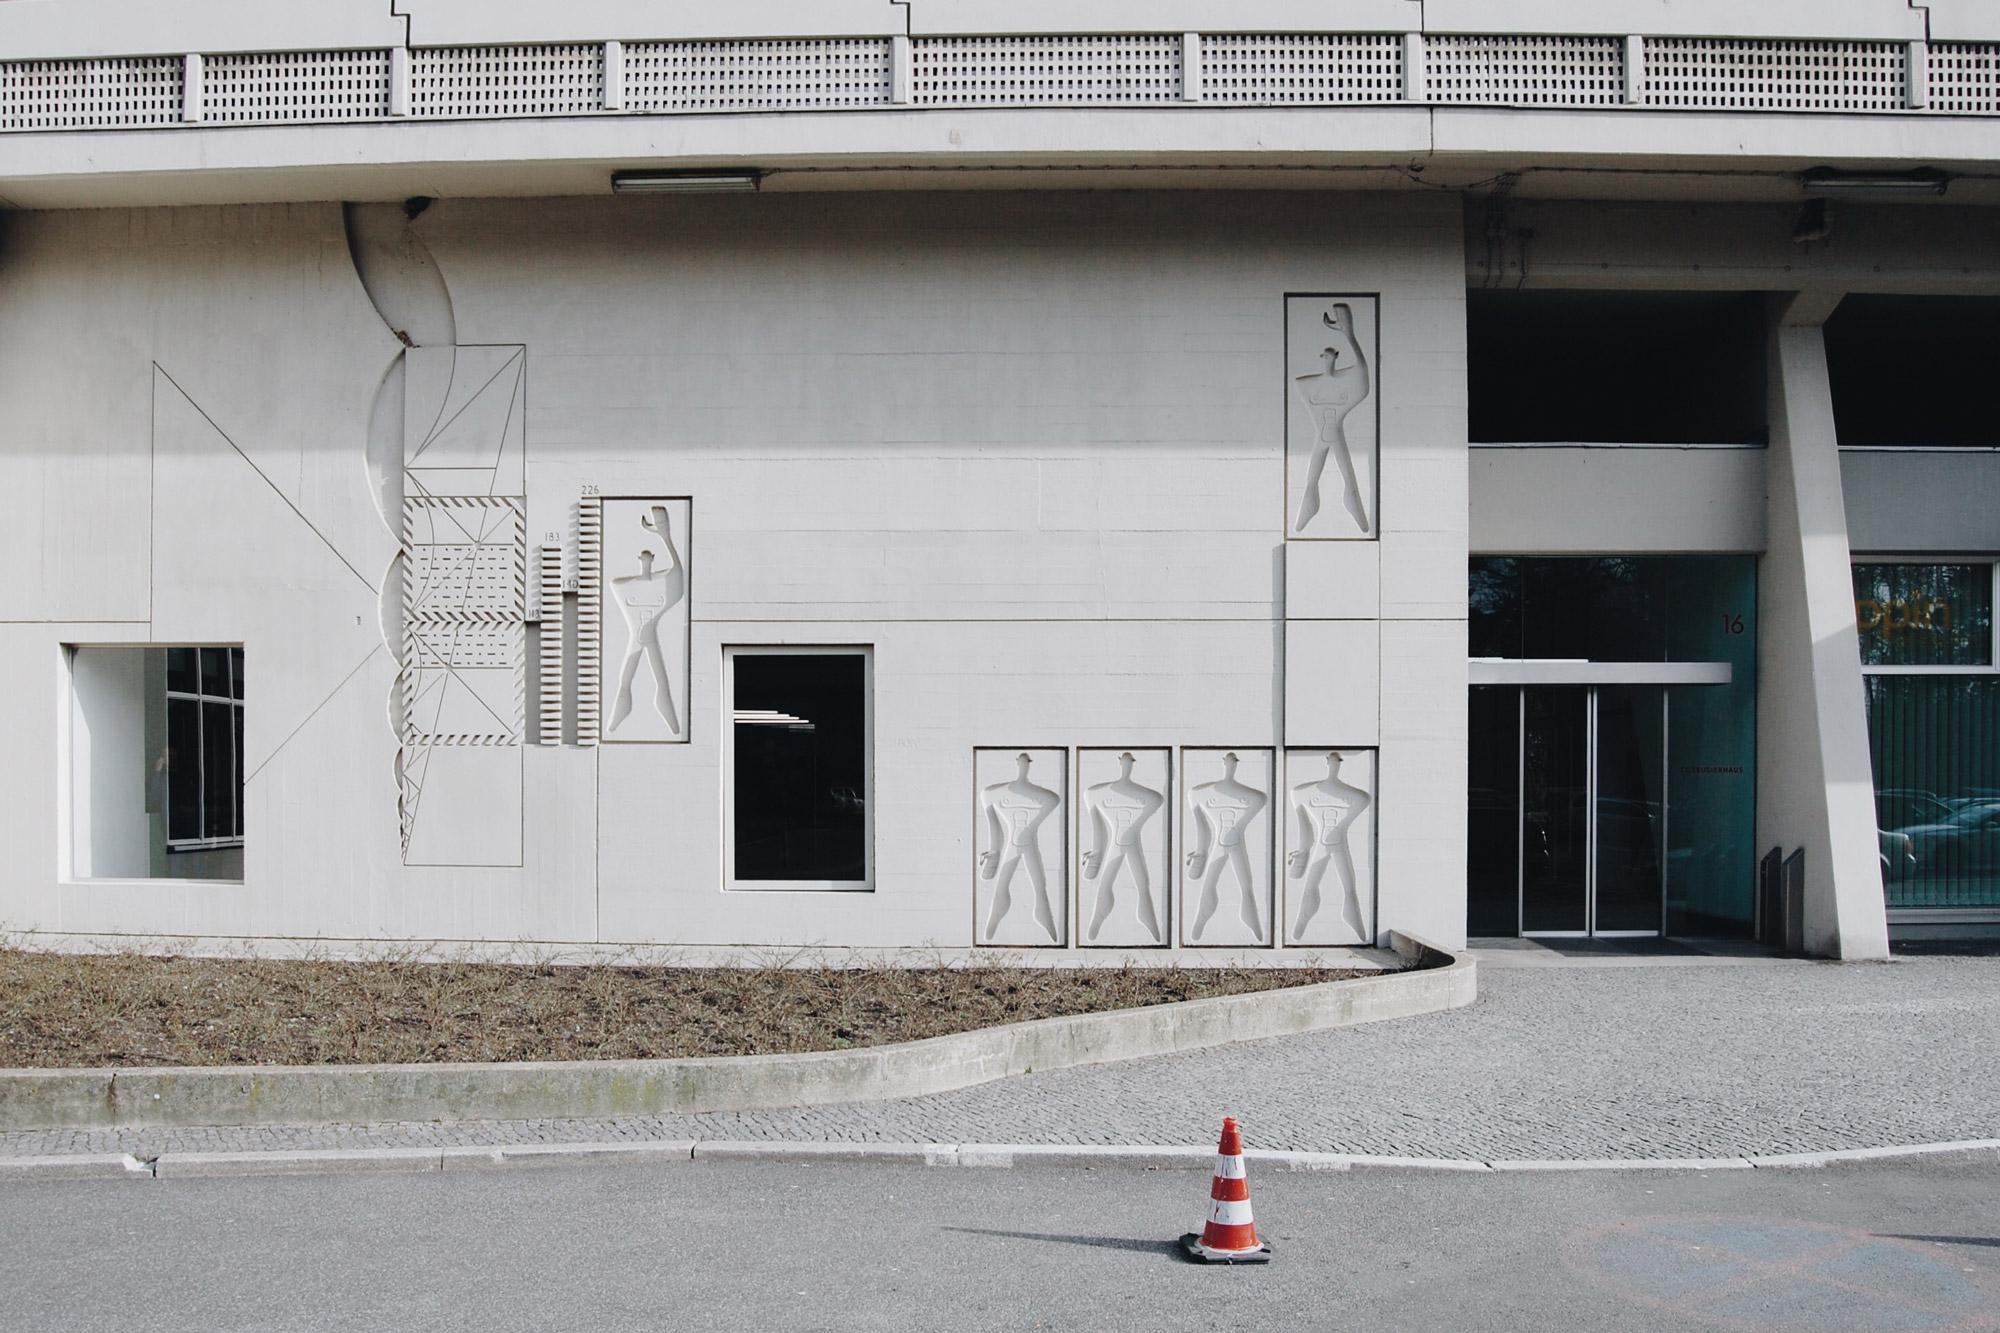 urbanbacklog-berlin-le-corbusier-unite-d-habitation-10.jpg